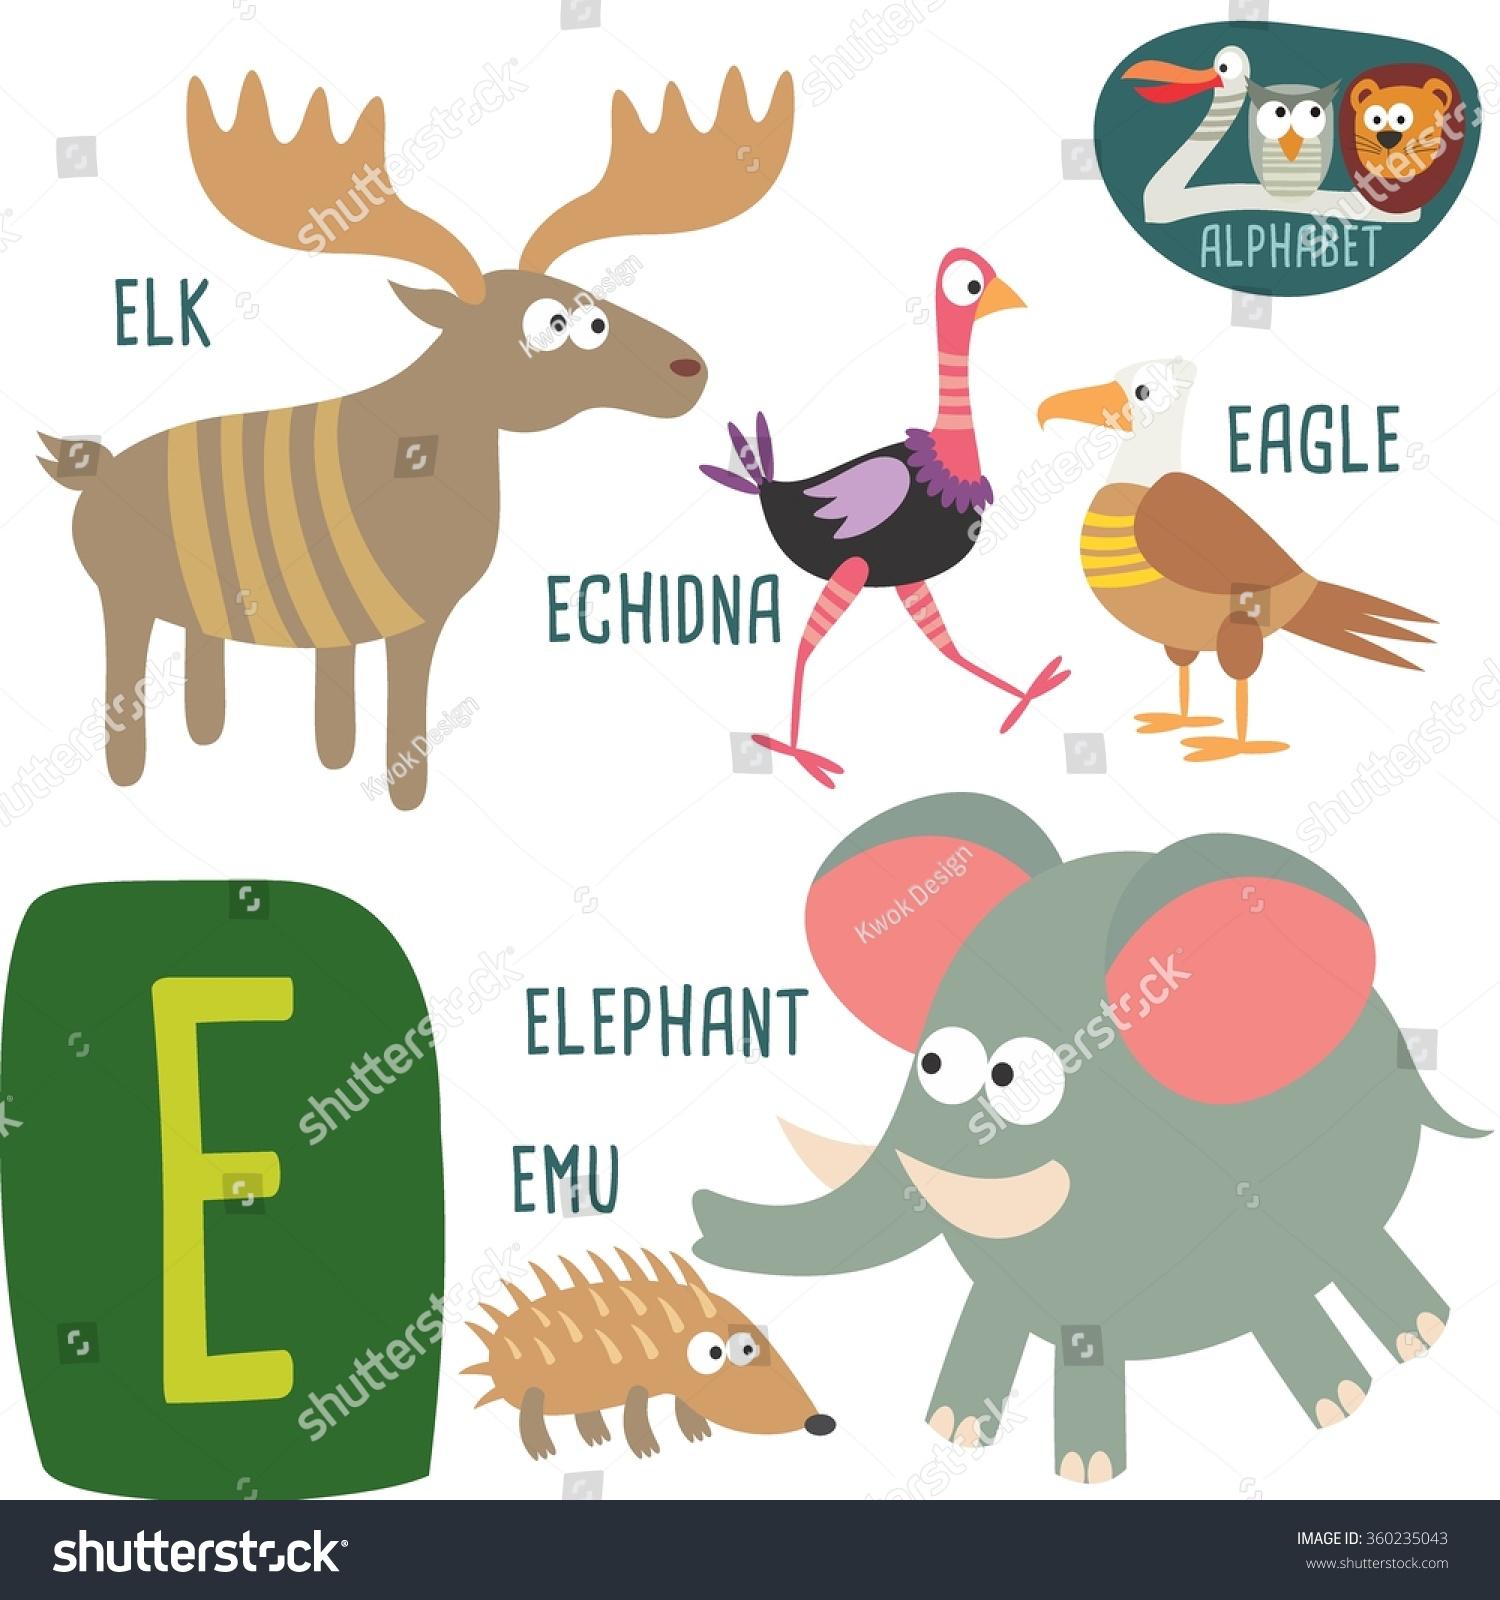 Cute Zoo Alphabet Vector E Letter Funny Stock Vector (Royalty Free